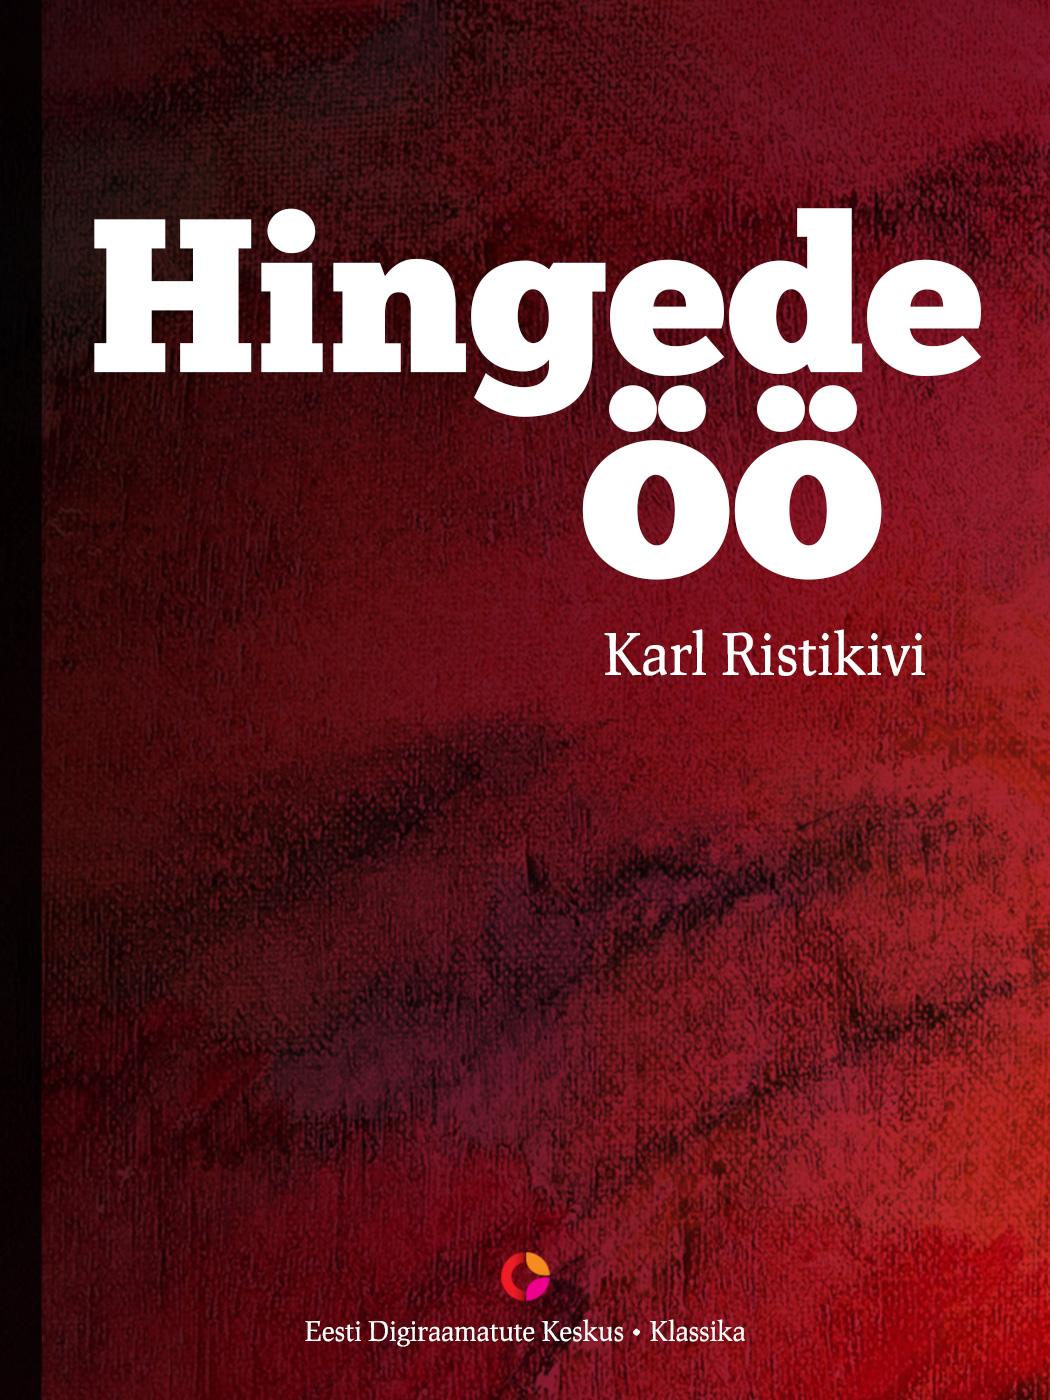 цена Karl Ristikivi Hingede öö онлайн в 2017 году